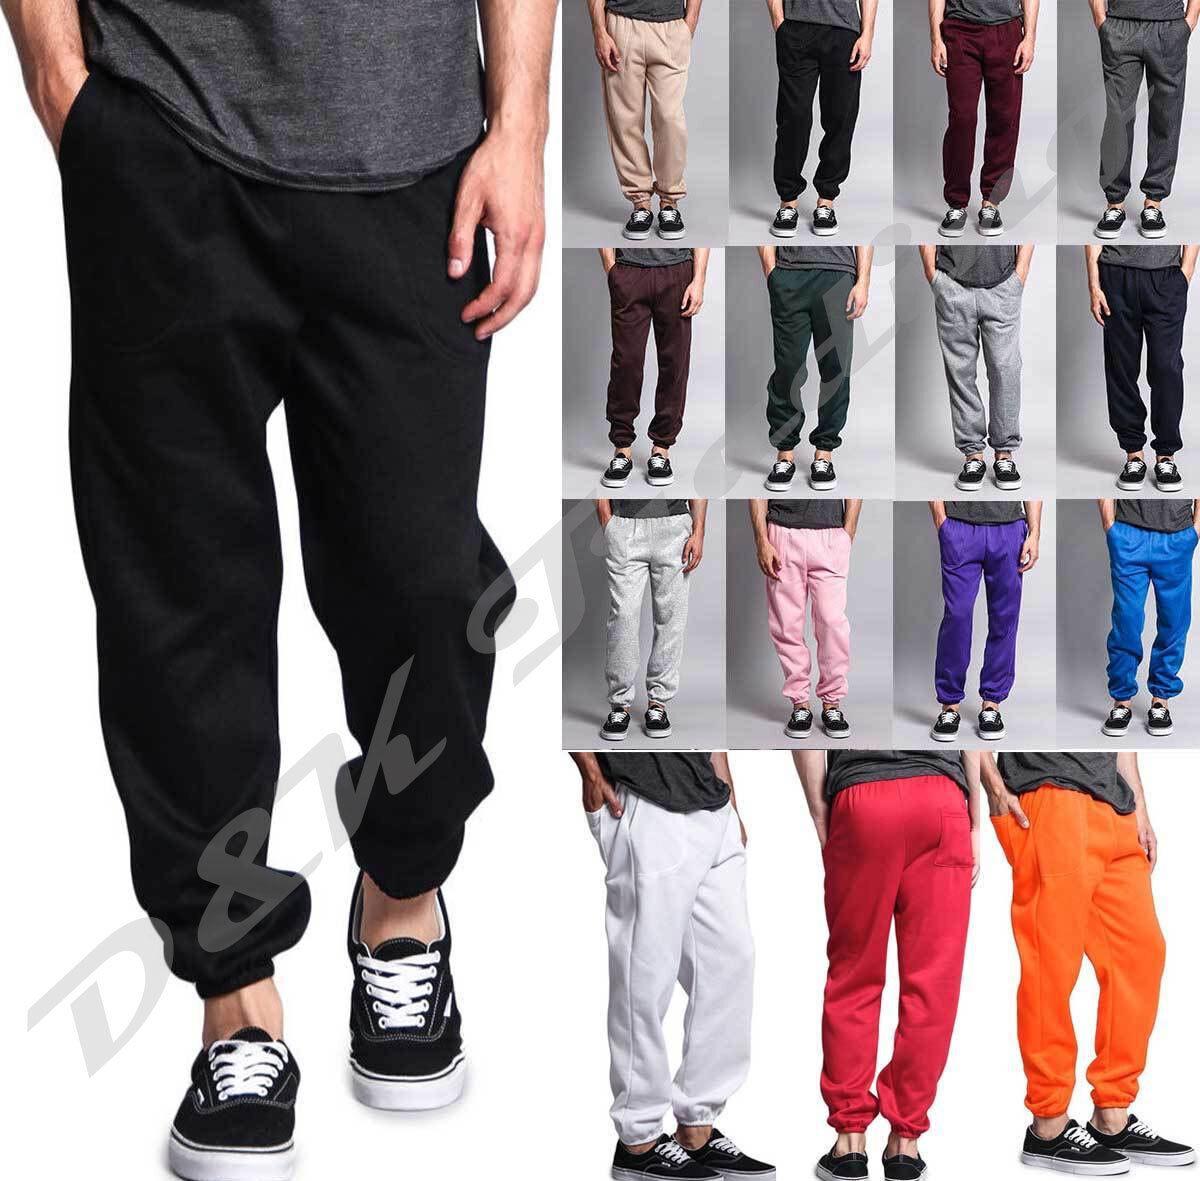 Unisex Men Women Pockets Fleece Sweatpants Workout Gym Pants